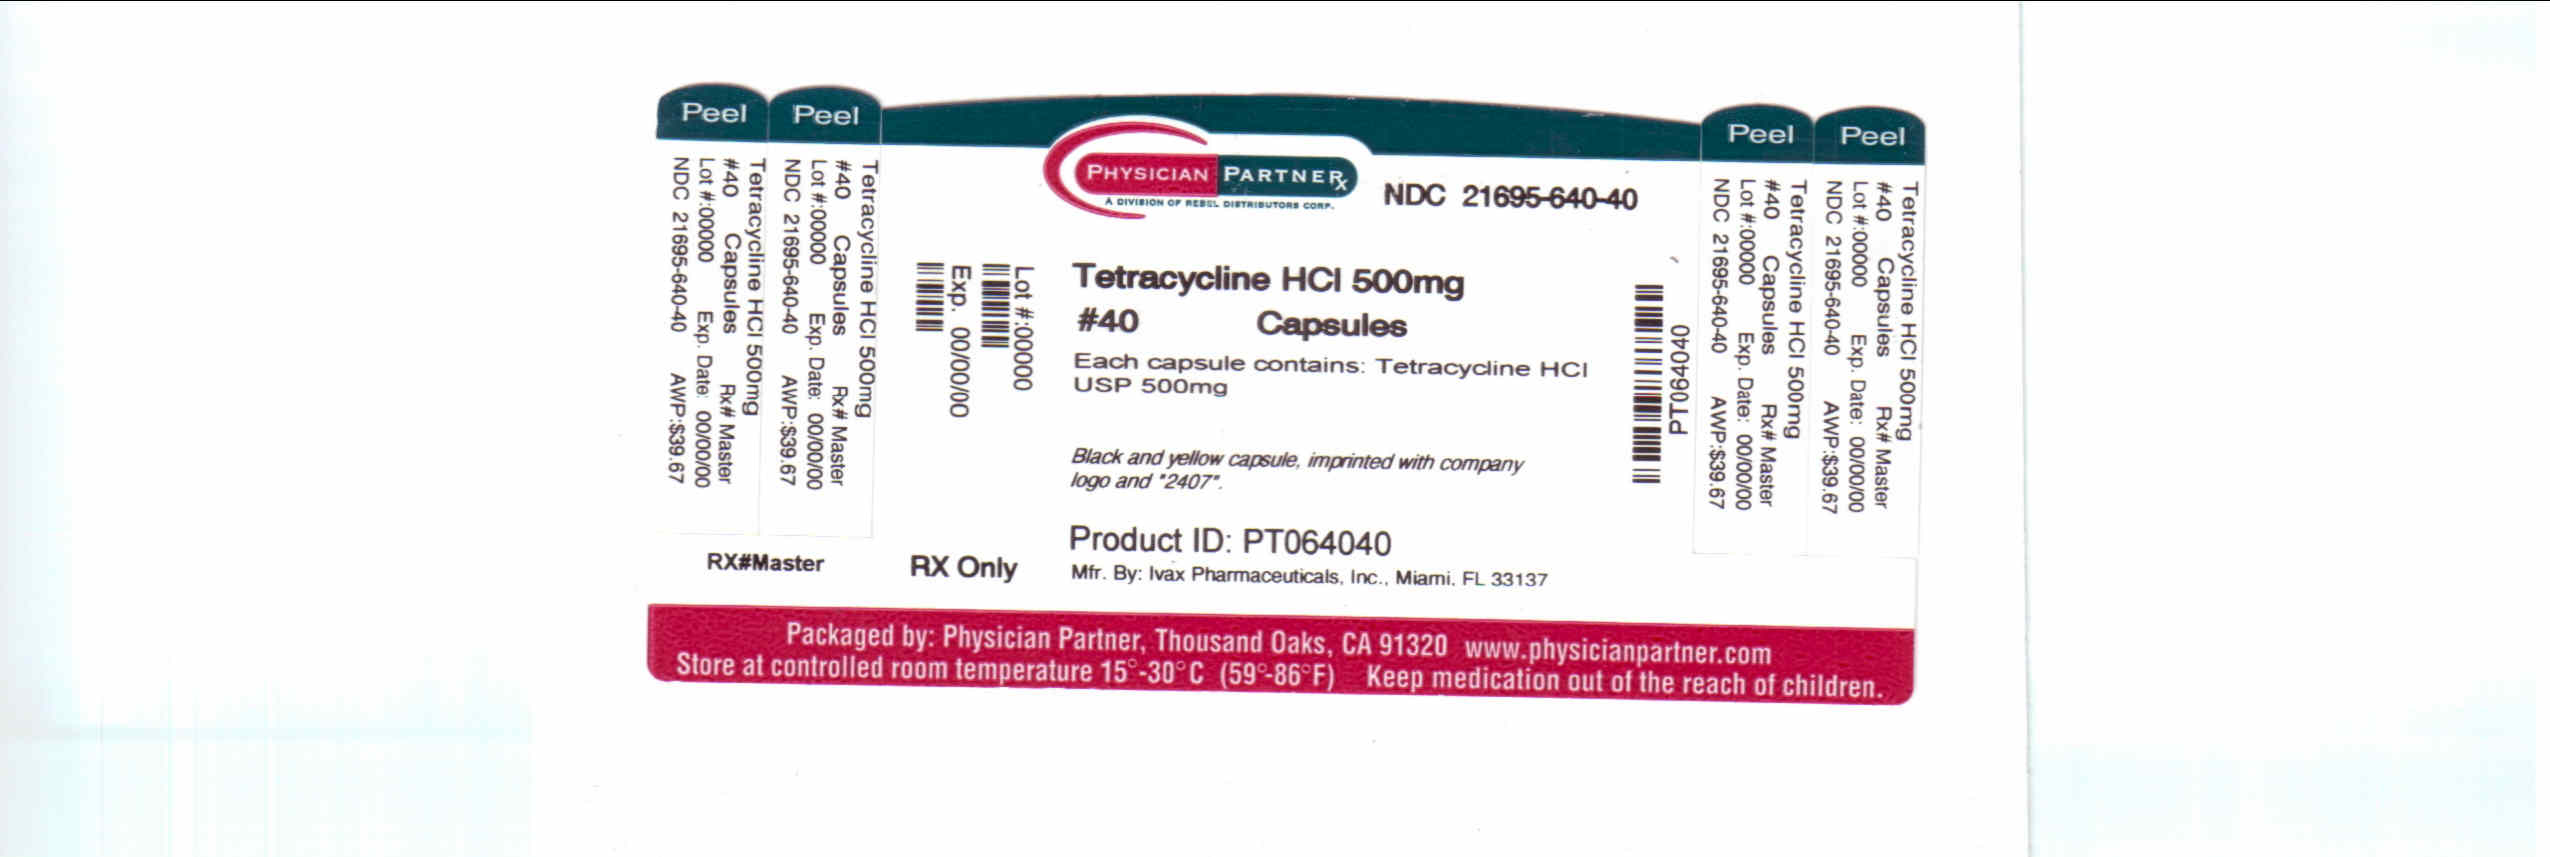 Tetracycline HCl 500mg